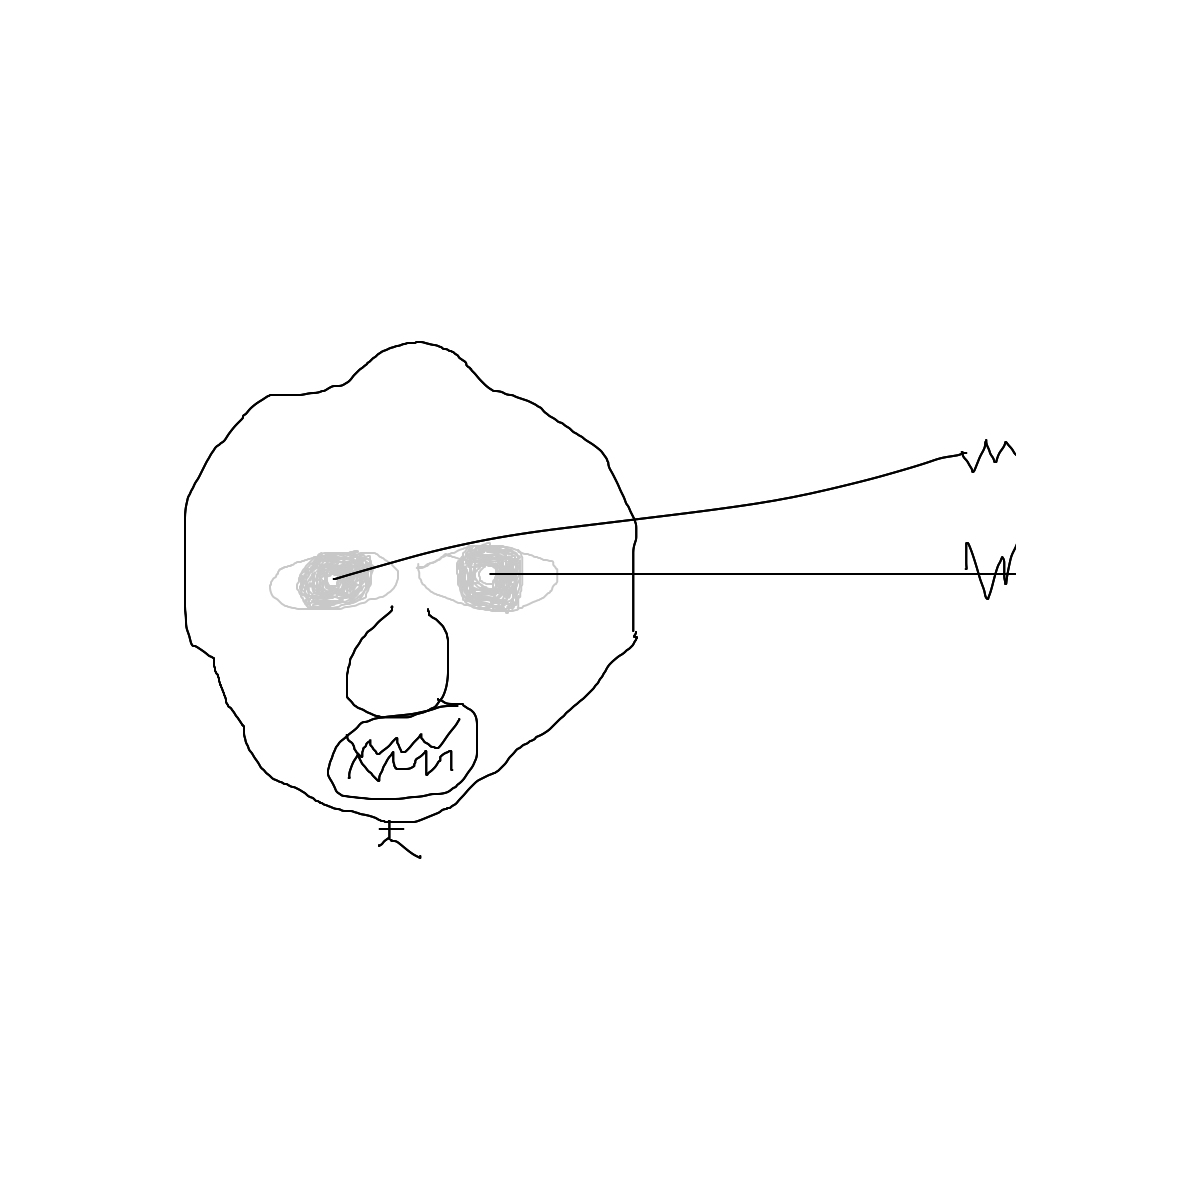 BAAAM drawing#6675 lat:43.9071083068847660lng: -78.7919845581054700